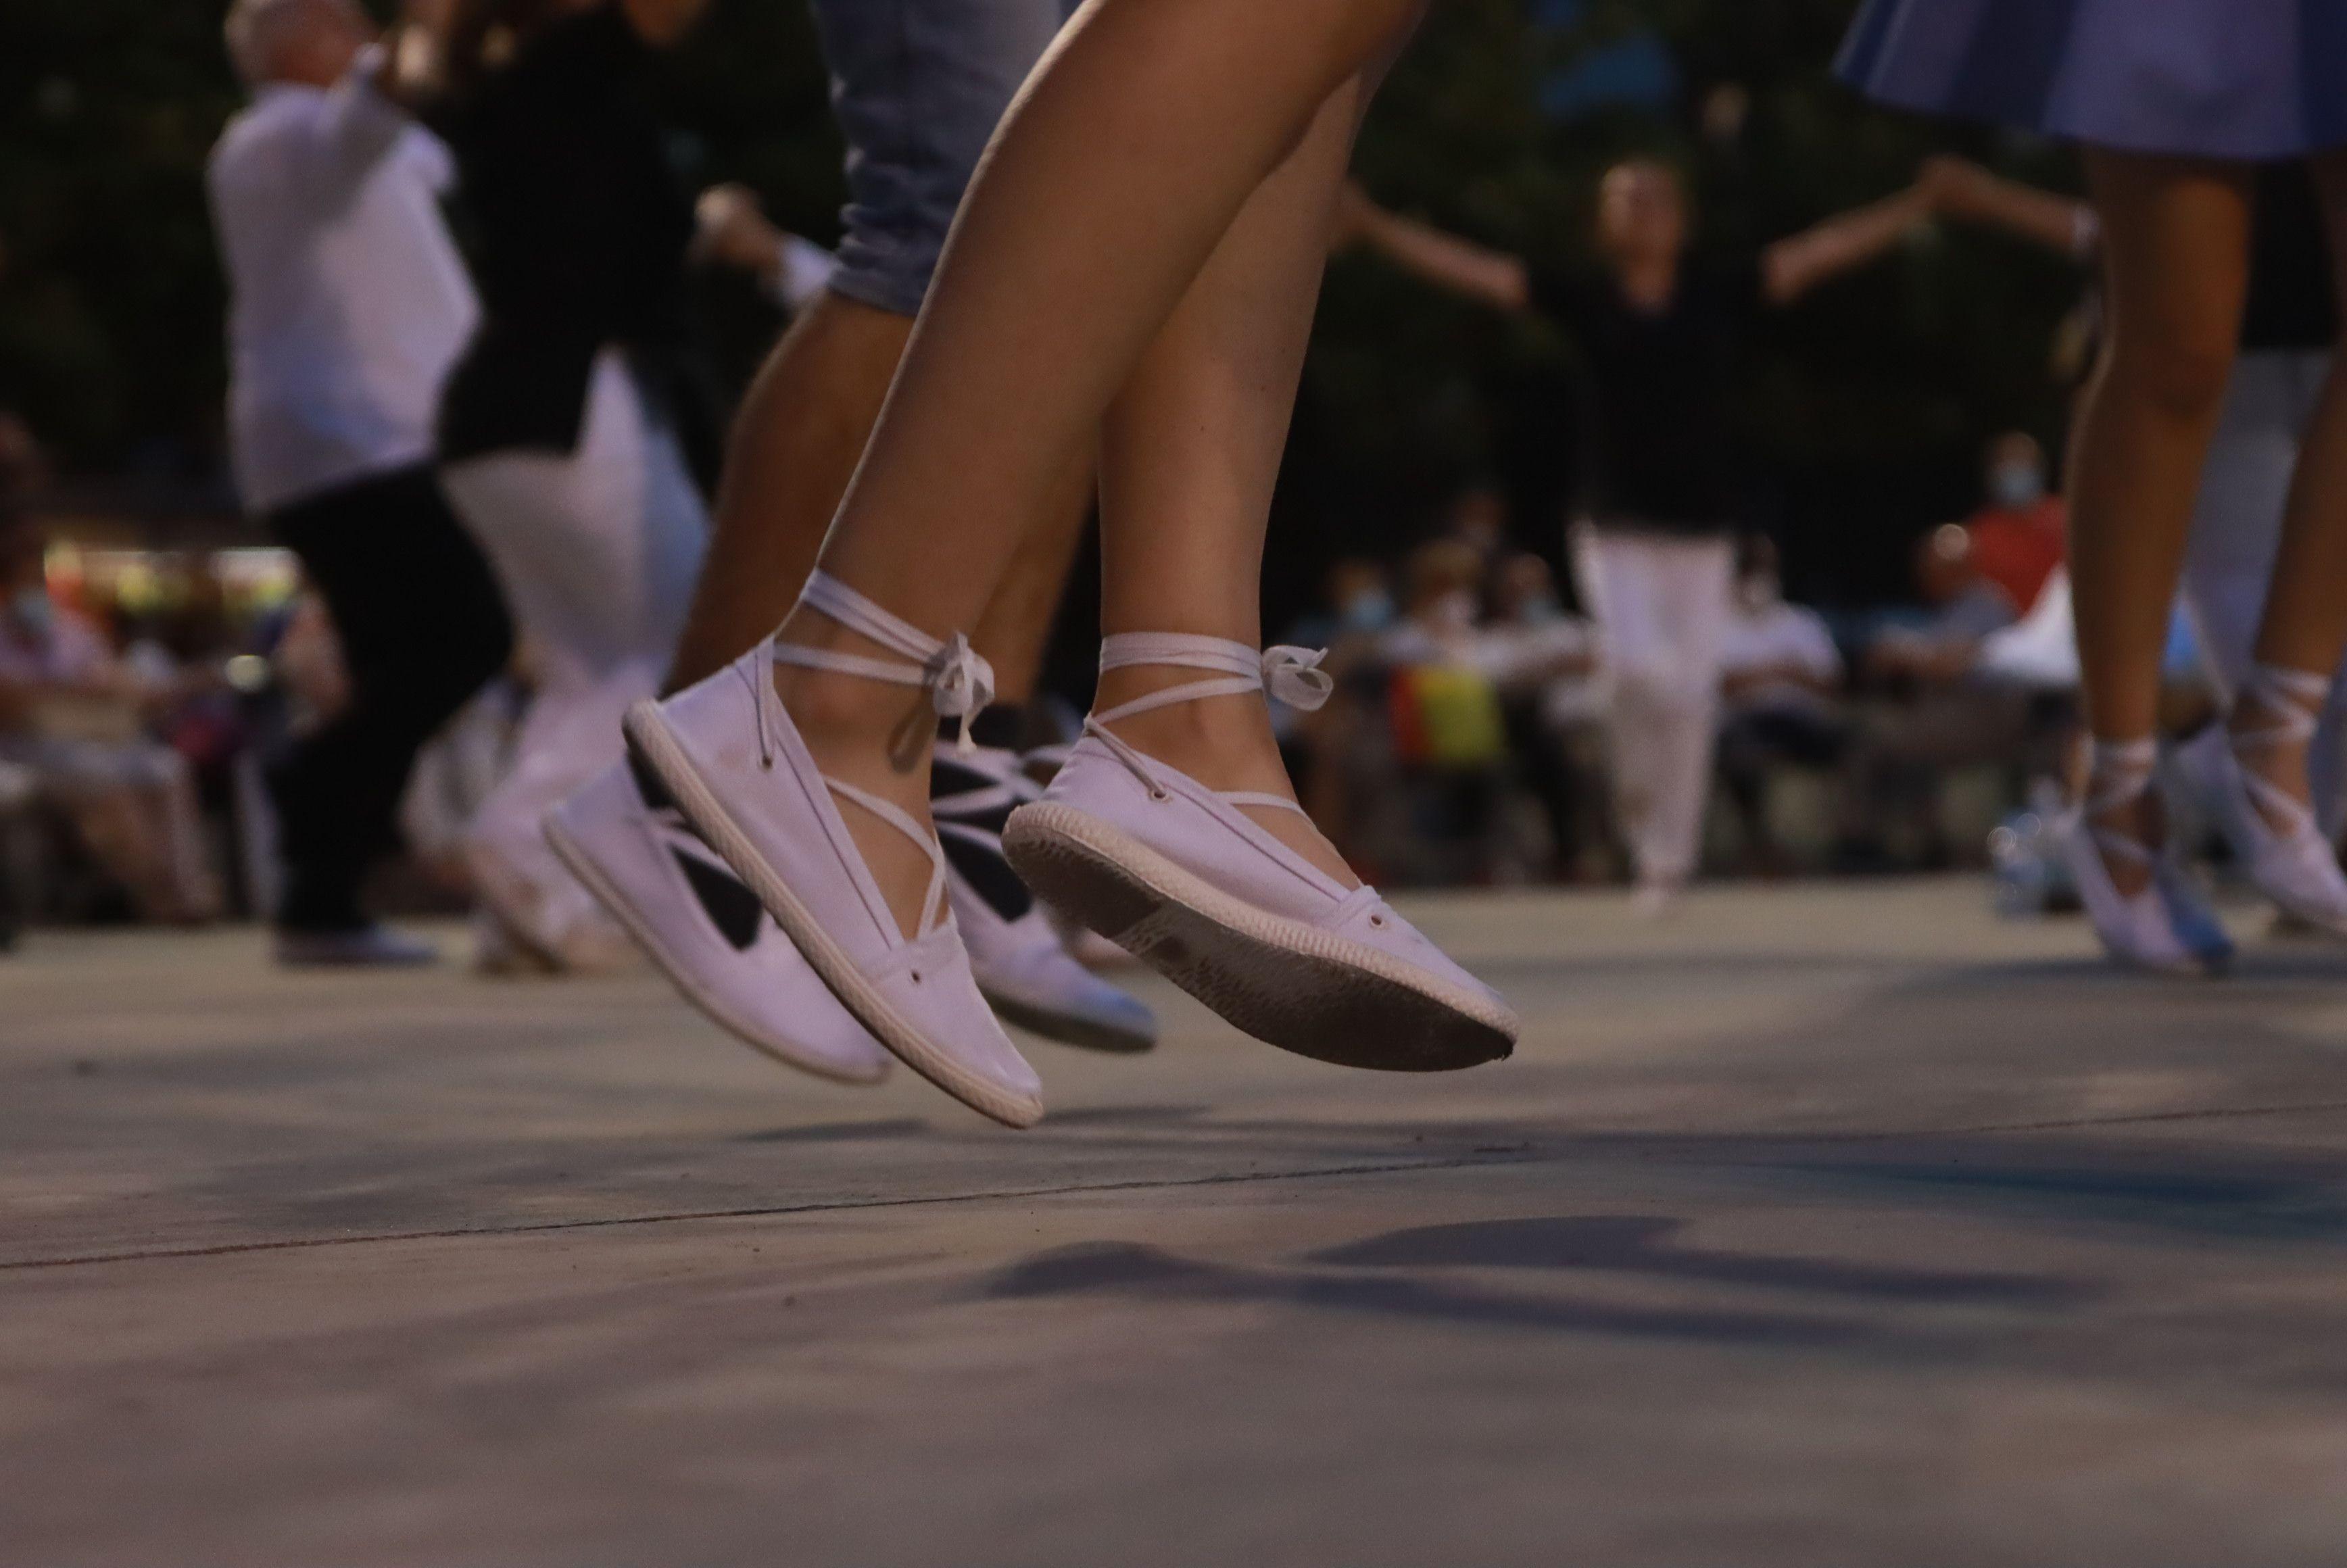 Concurs de colles sardanistes per Festa Major a Rubí. FOTO: Josep Llamas